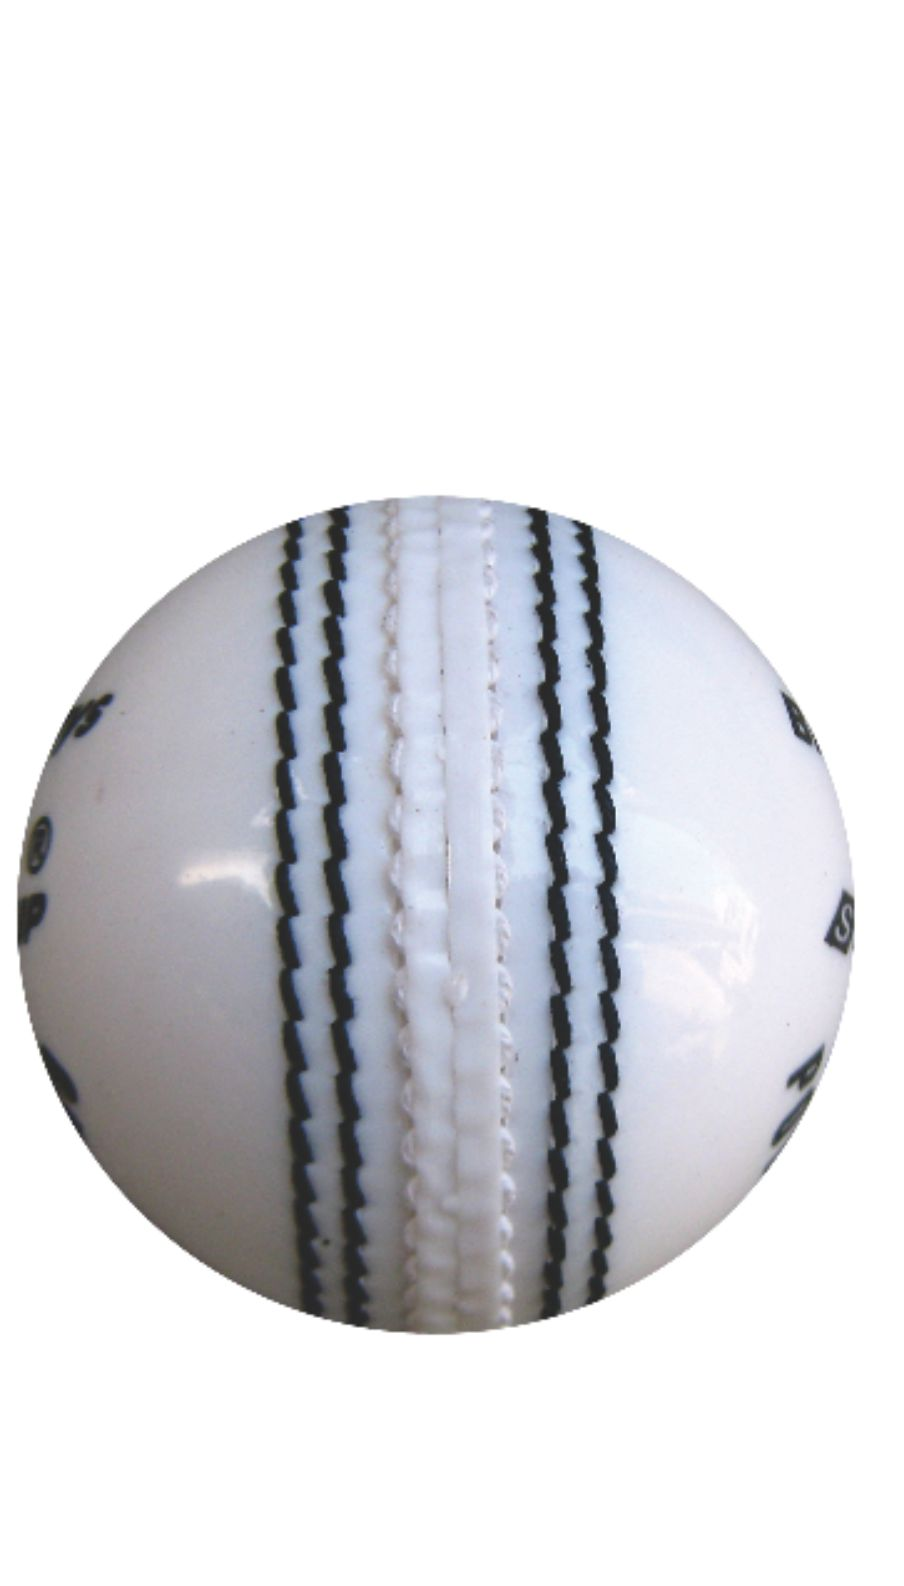 2138 POLY SOFT CRICKET BALL WHITE